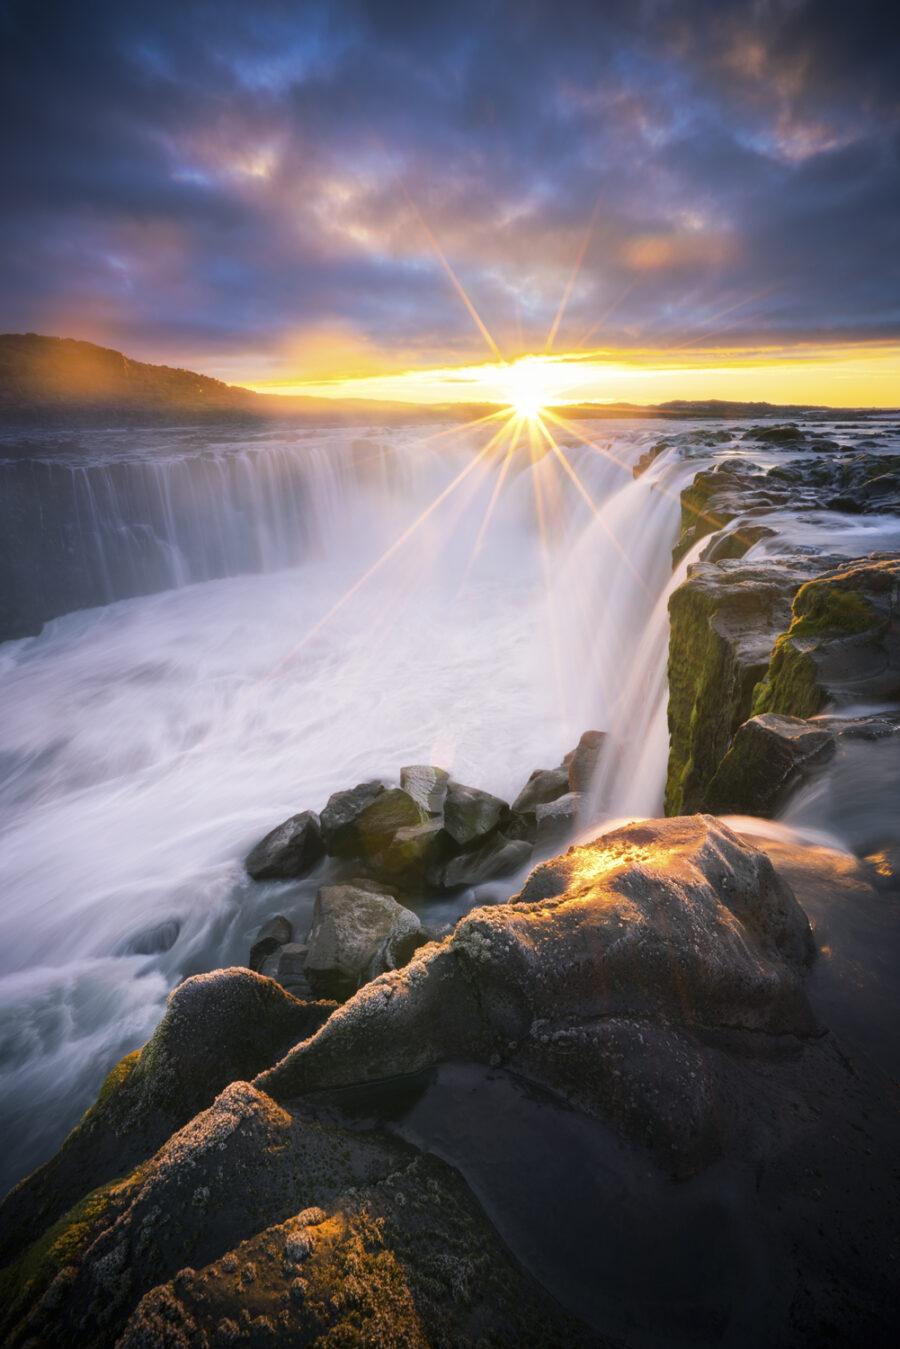 Sunrise over Selfoss, Iceland